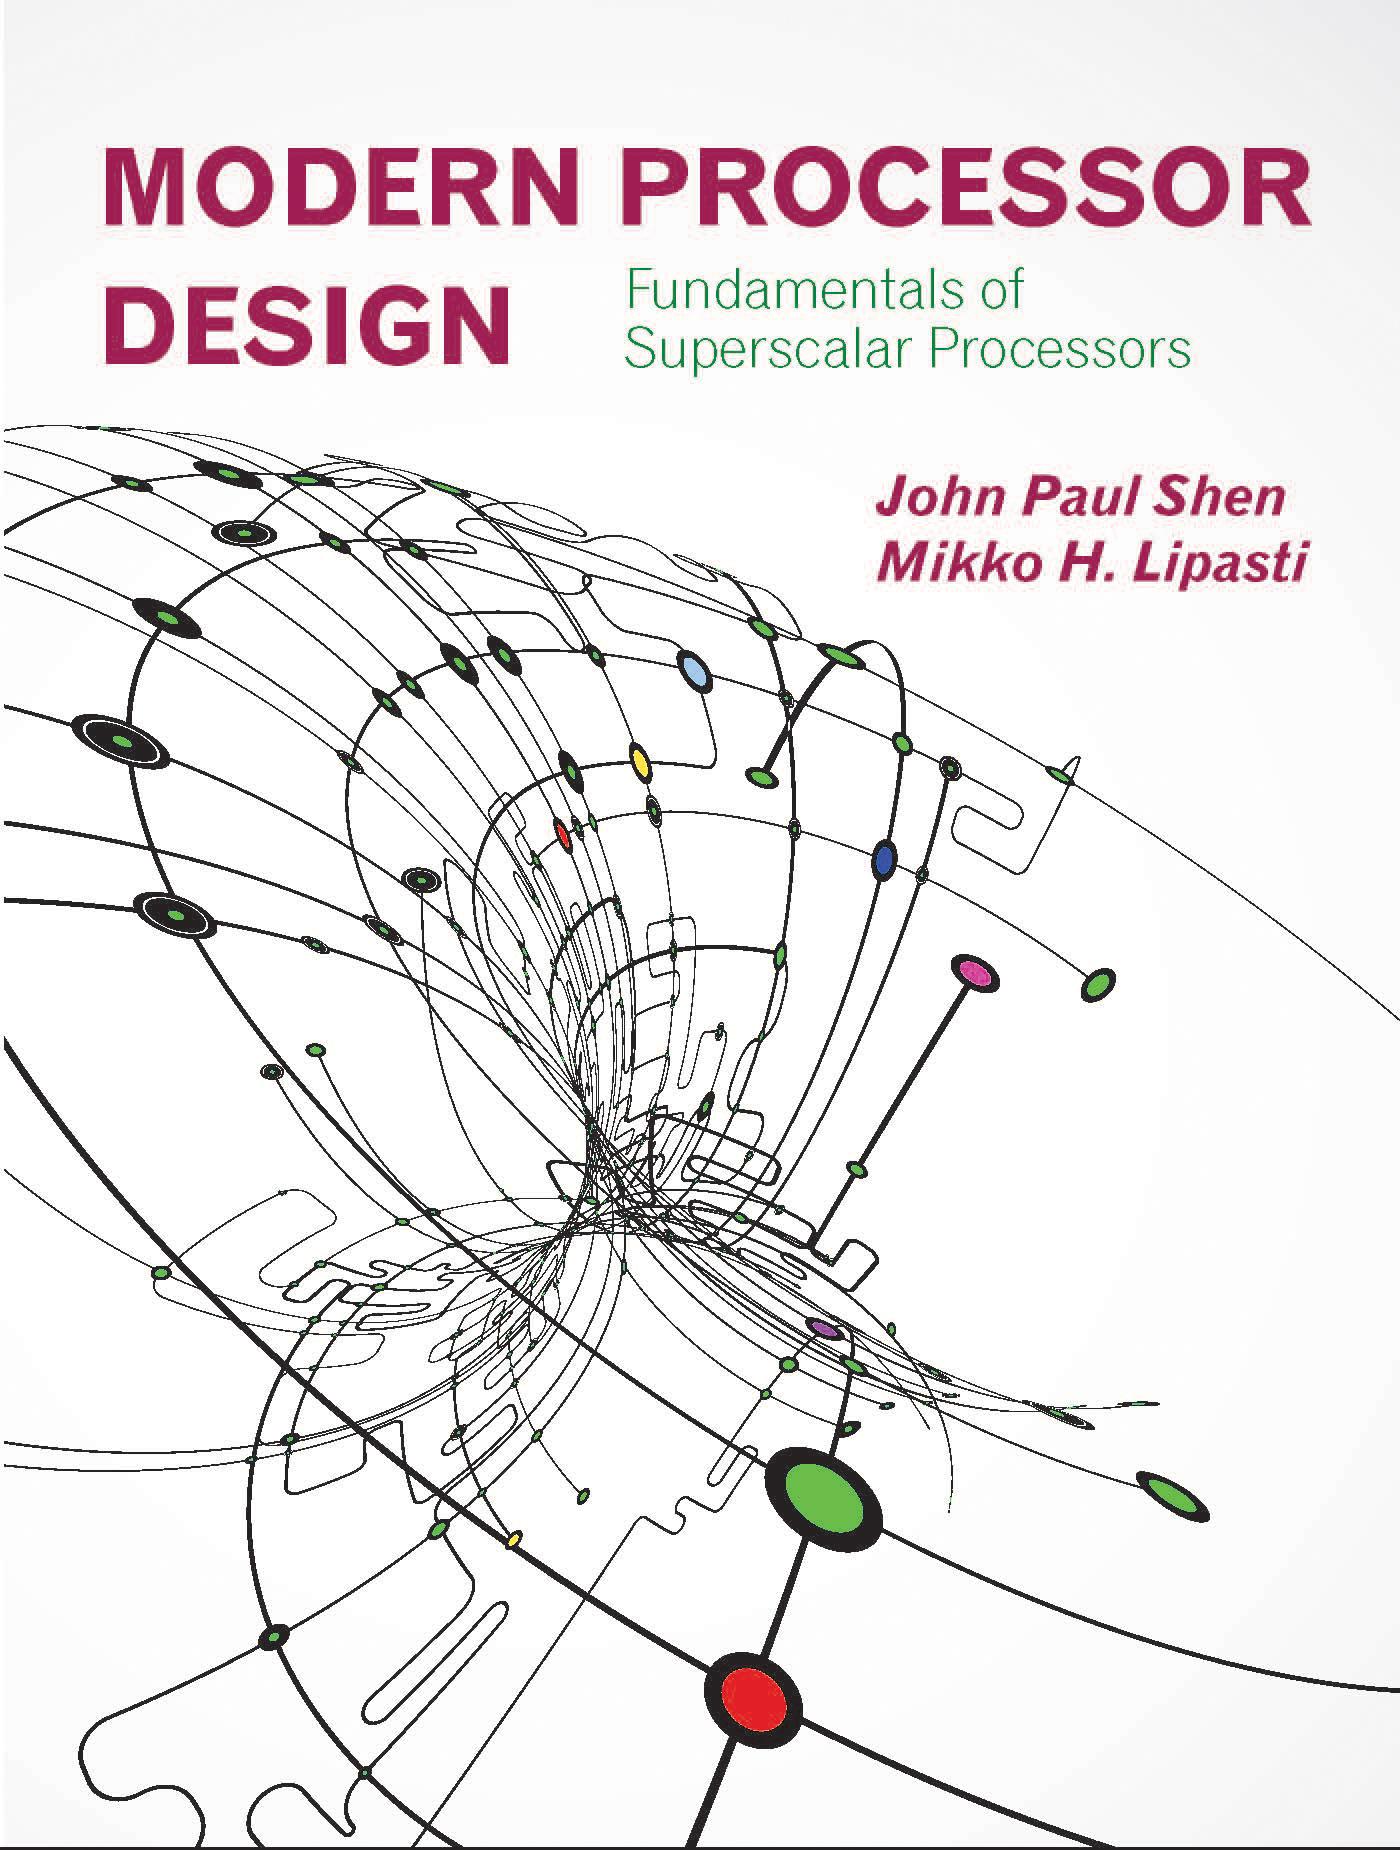 Modern Processor Design: Fundamentals of Superscalar Processors by John Paul Shen, Mikko H. Lipasti